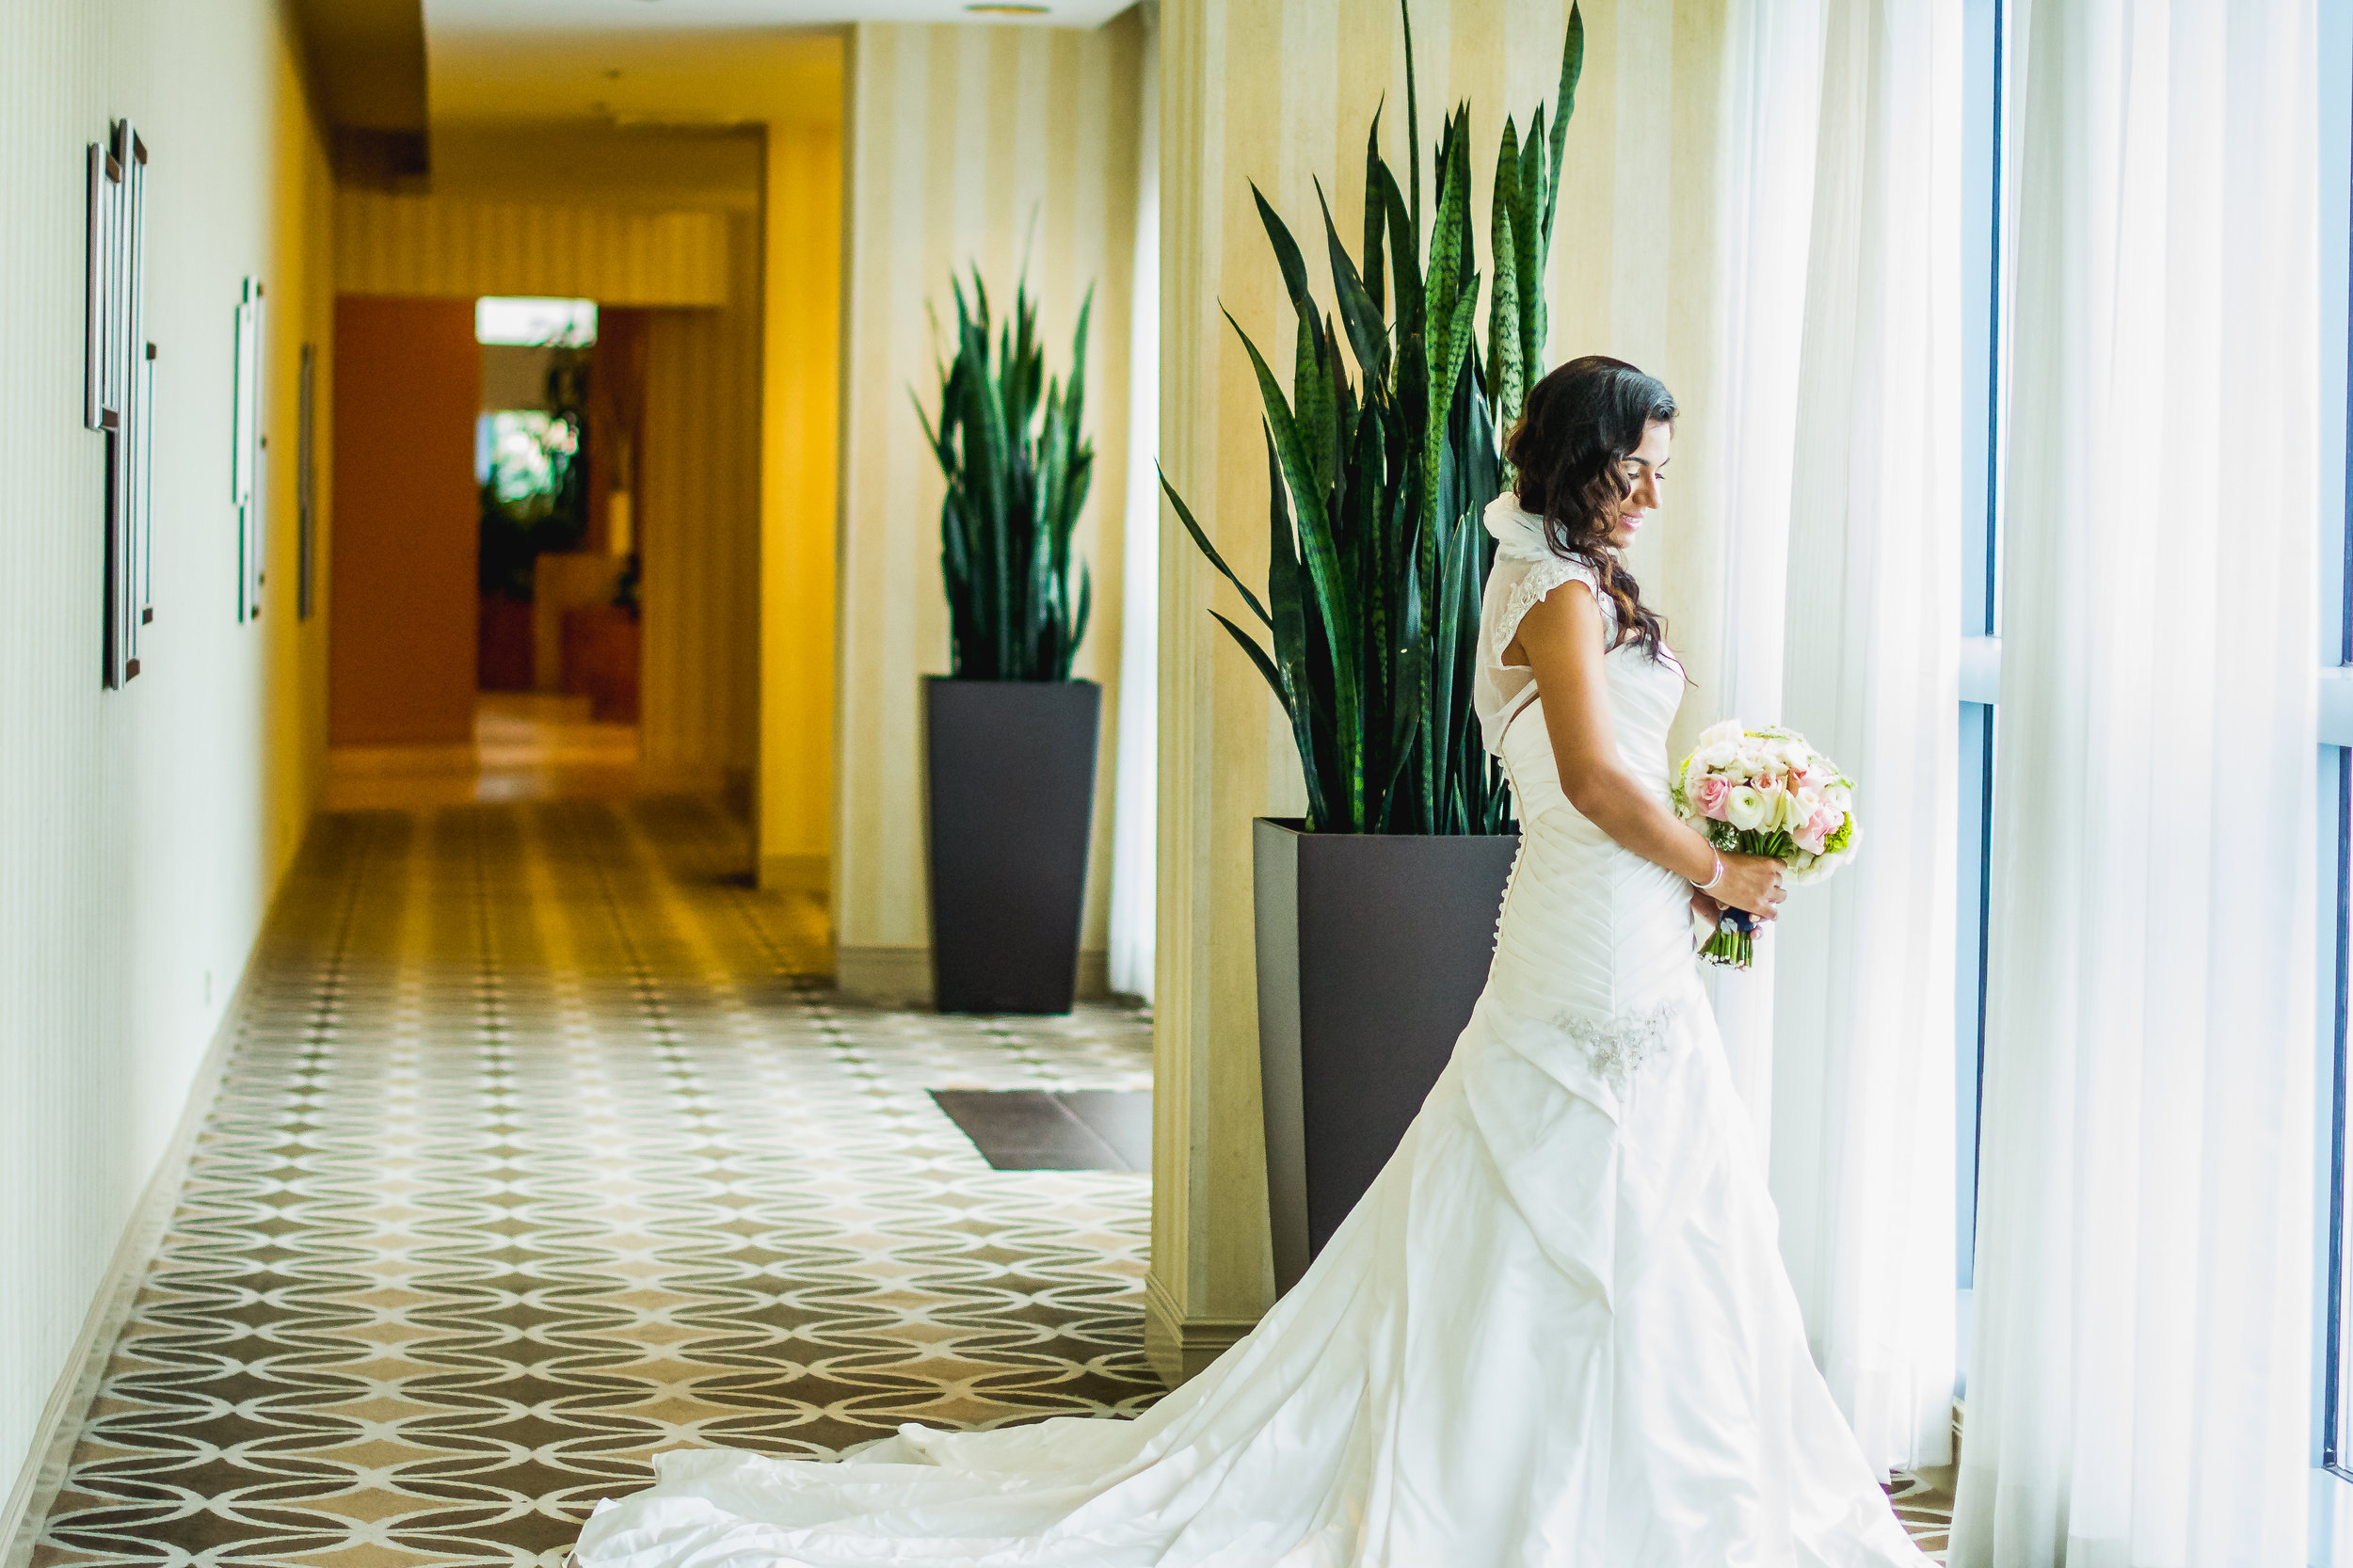 Imani J Portraits_Wedding Photographer_Melbourne Florida_Hilton Rialto_window pose6 (1 of 1).jpg